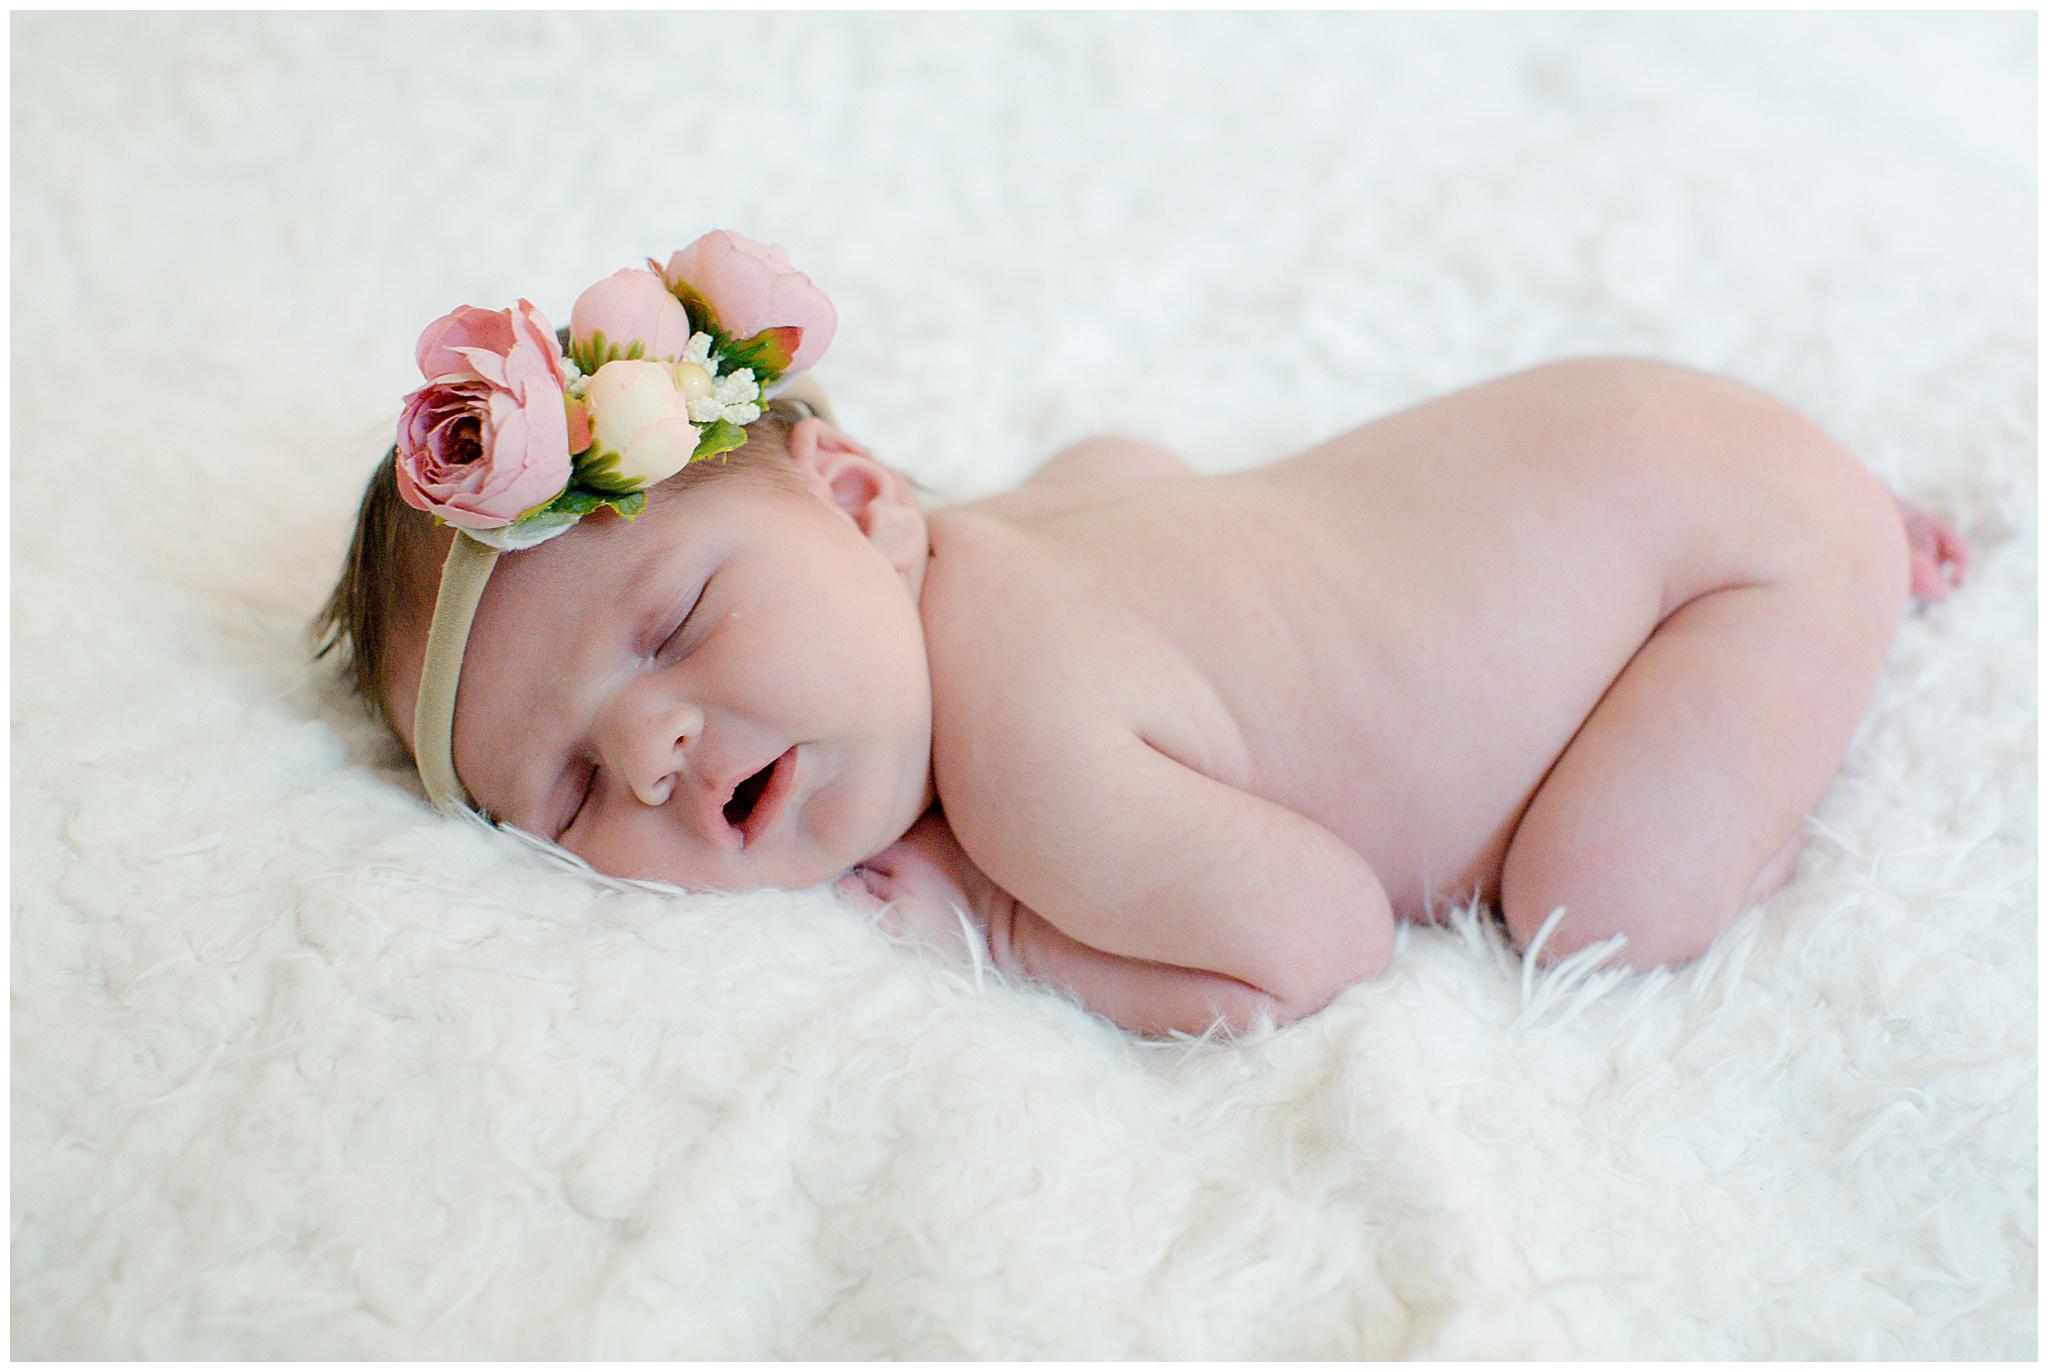 baby-Norah_0012.jpg